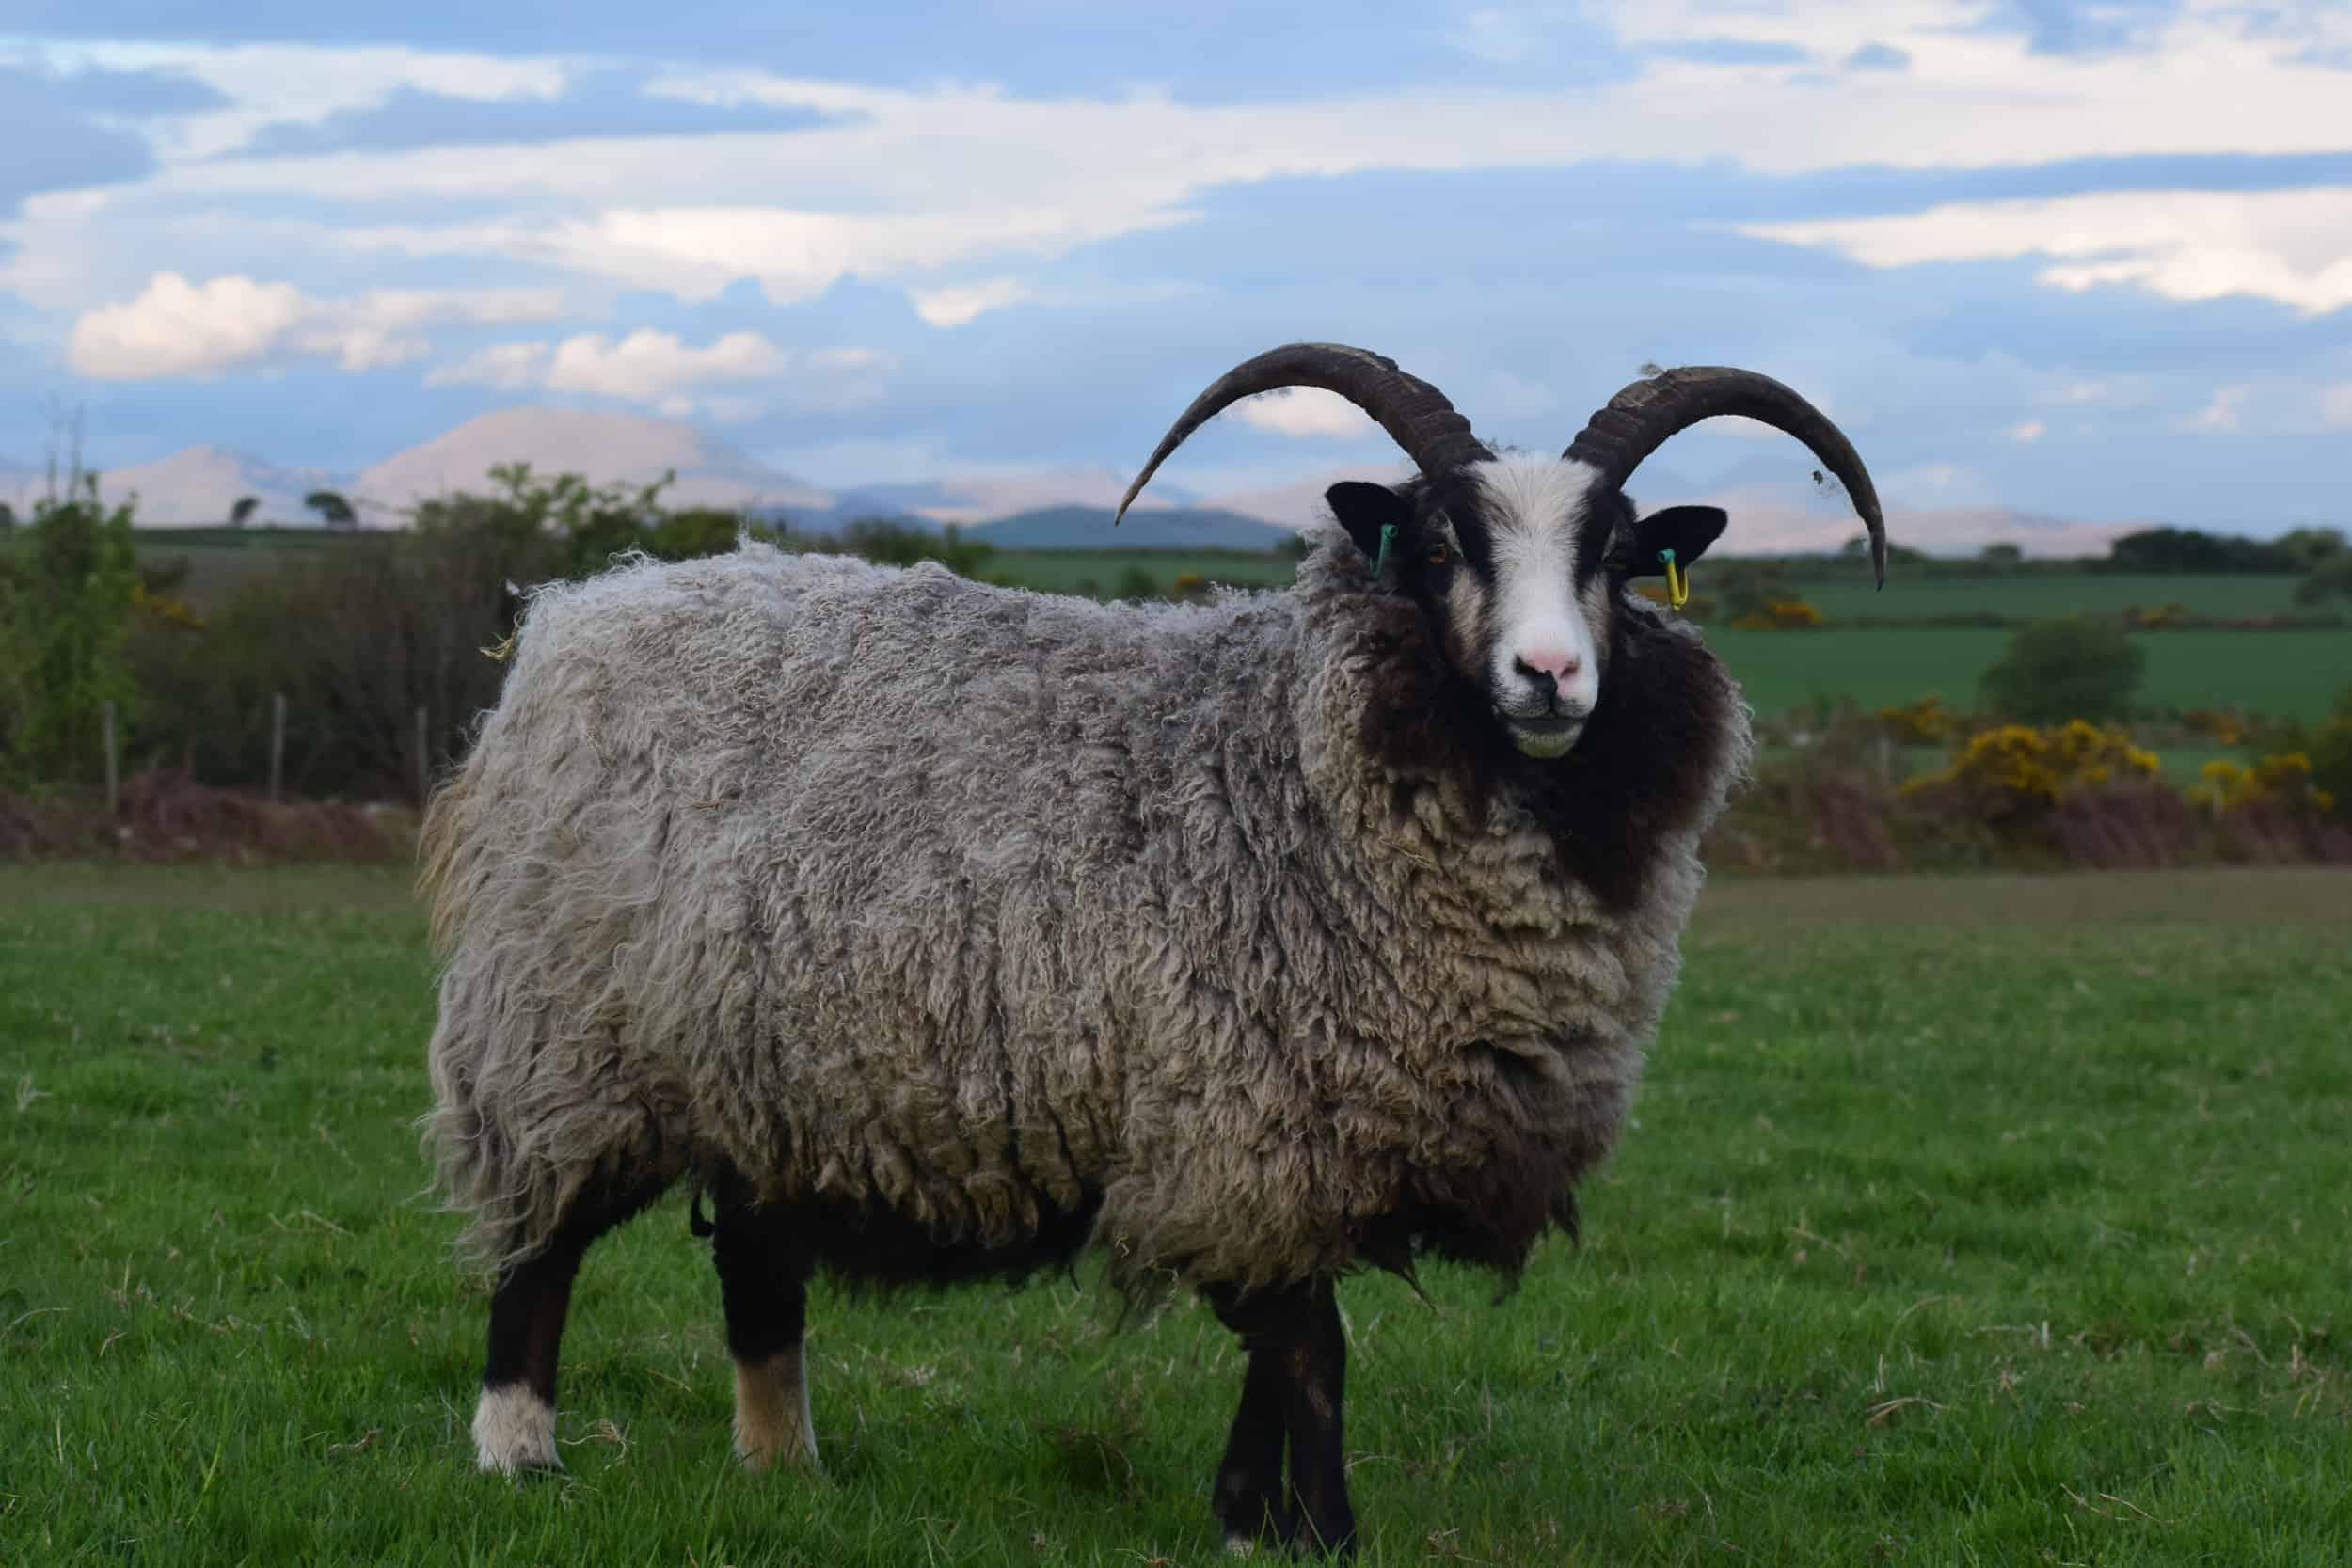 Poppy magnificent horns katmoget badgerface shetland cross jacob sheep lamb cute